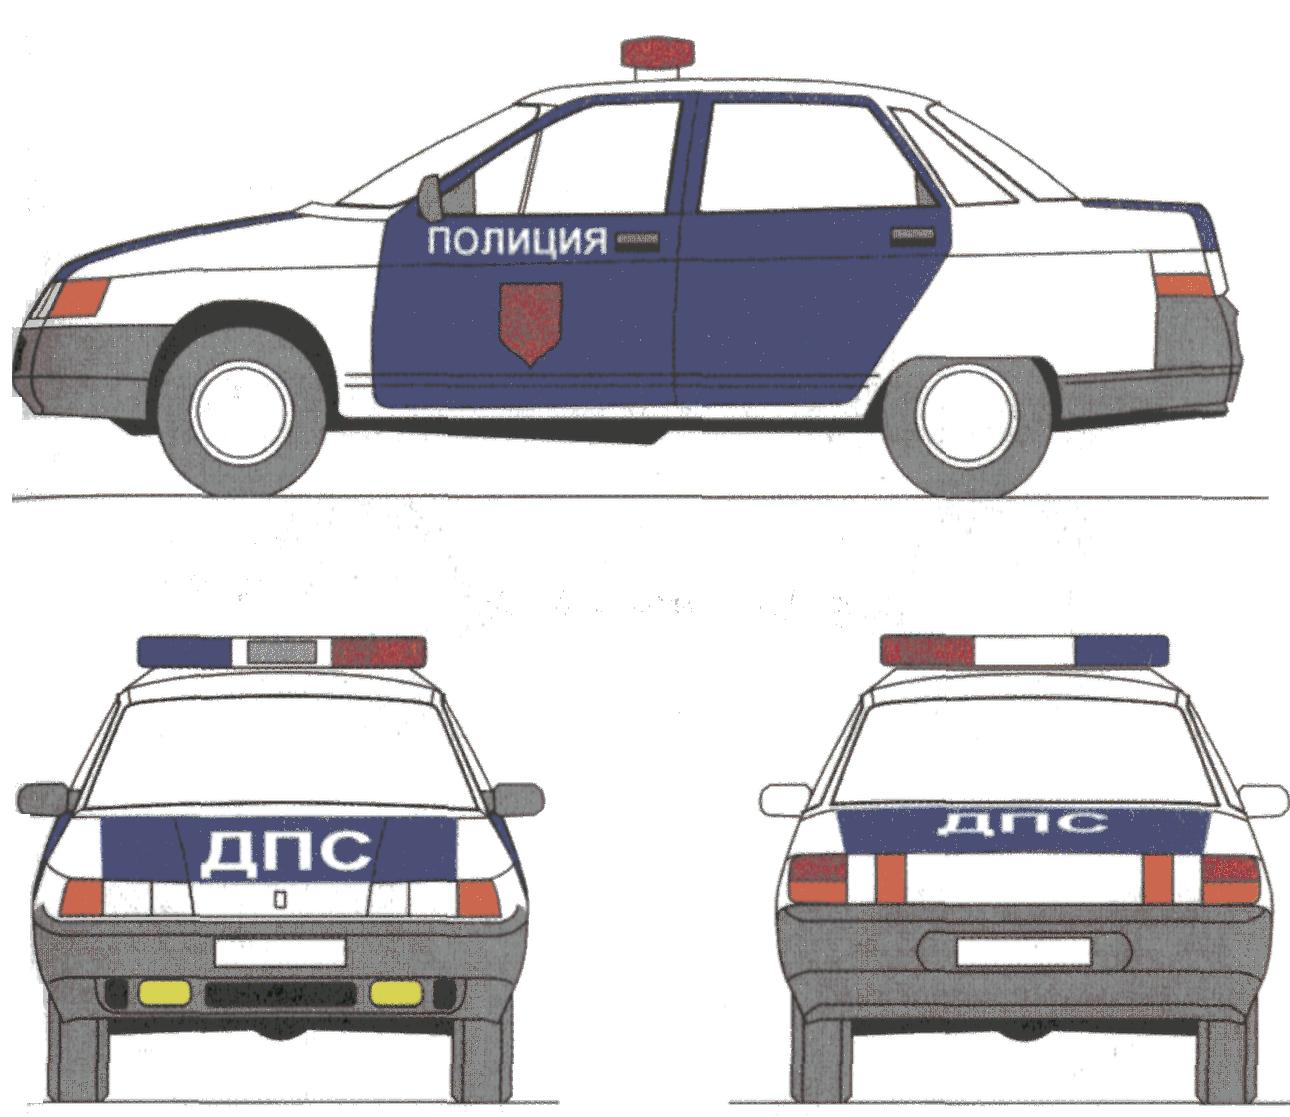 РИСУНОК А.12 (К ГОСТ Р 50574-2002)